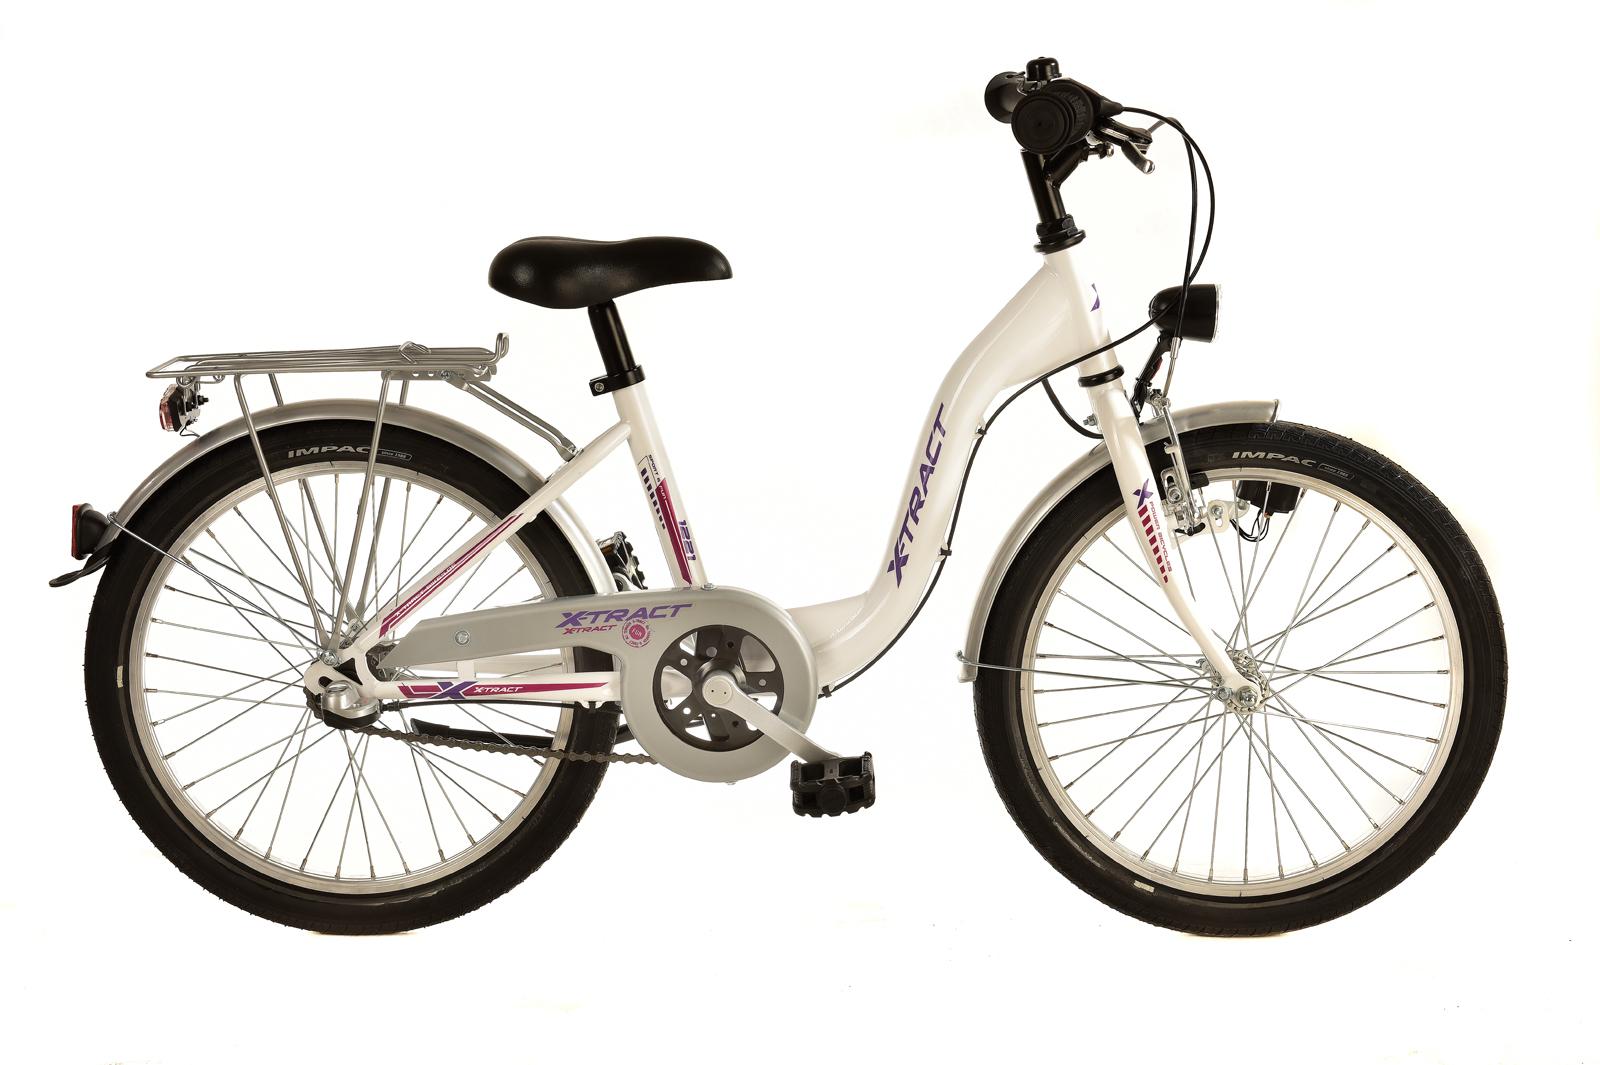 X Tract 1221 Weiss Feldmeier Bikes